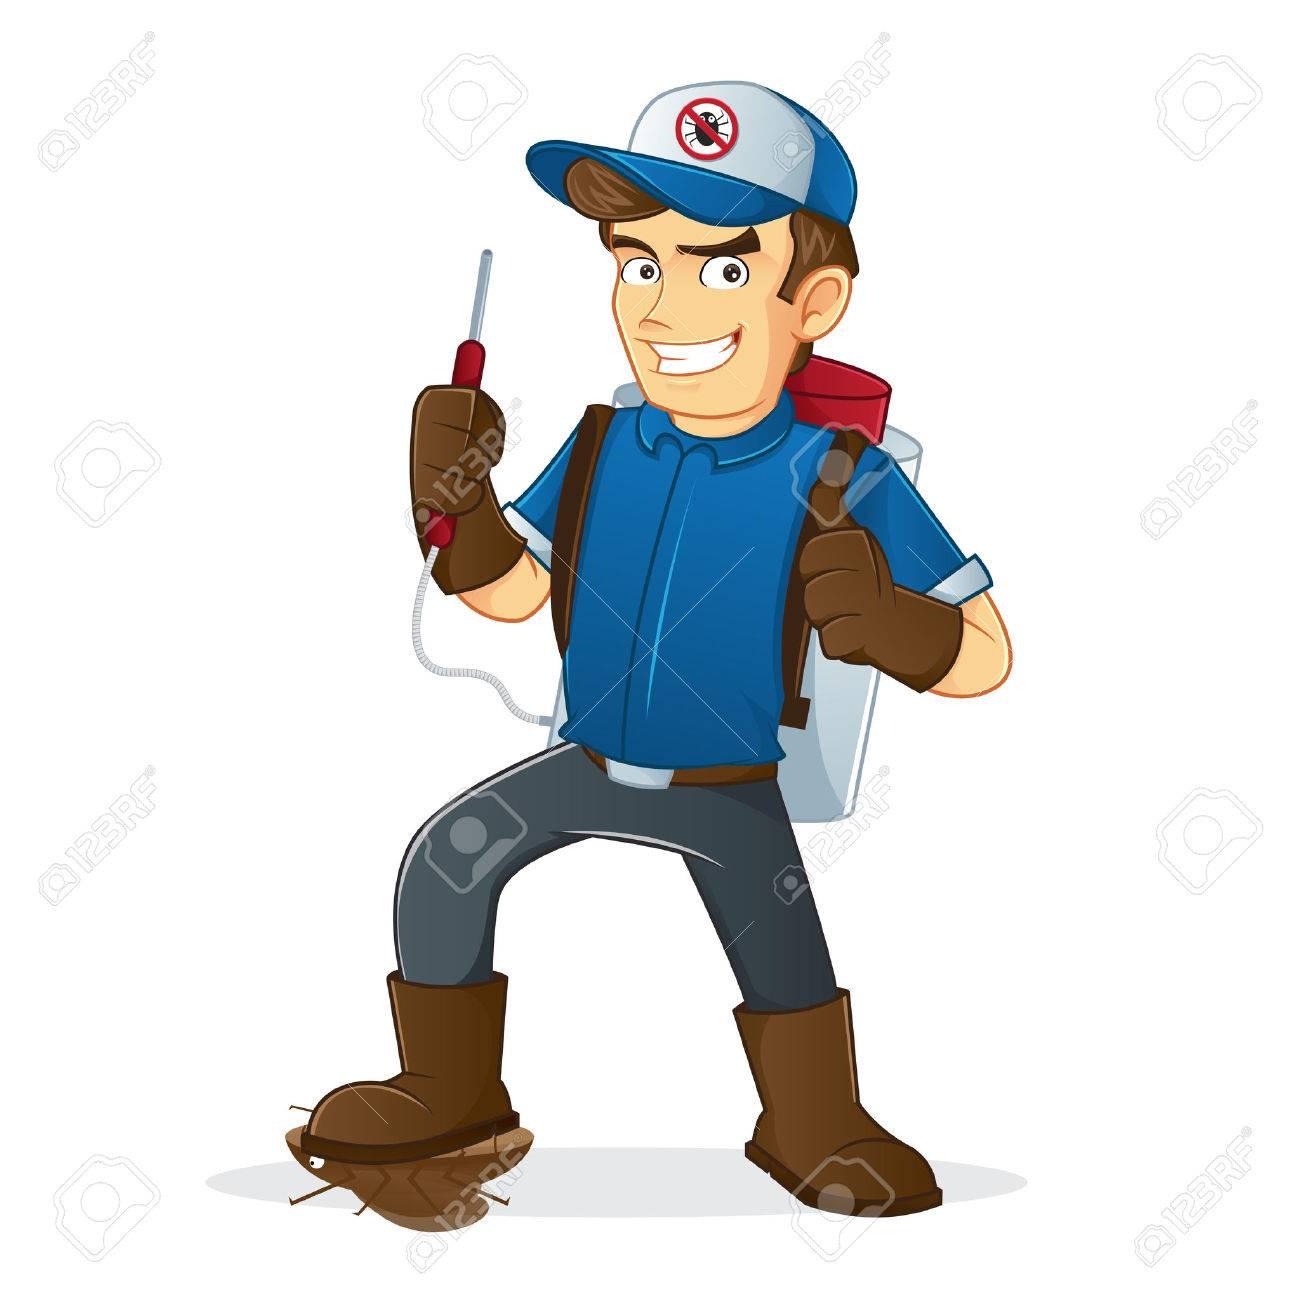 Exterminator Hold Pest Sprayer - 50297926